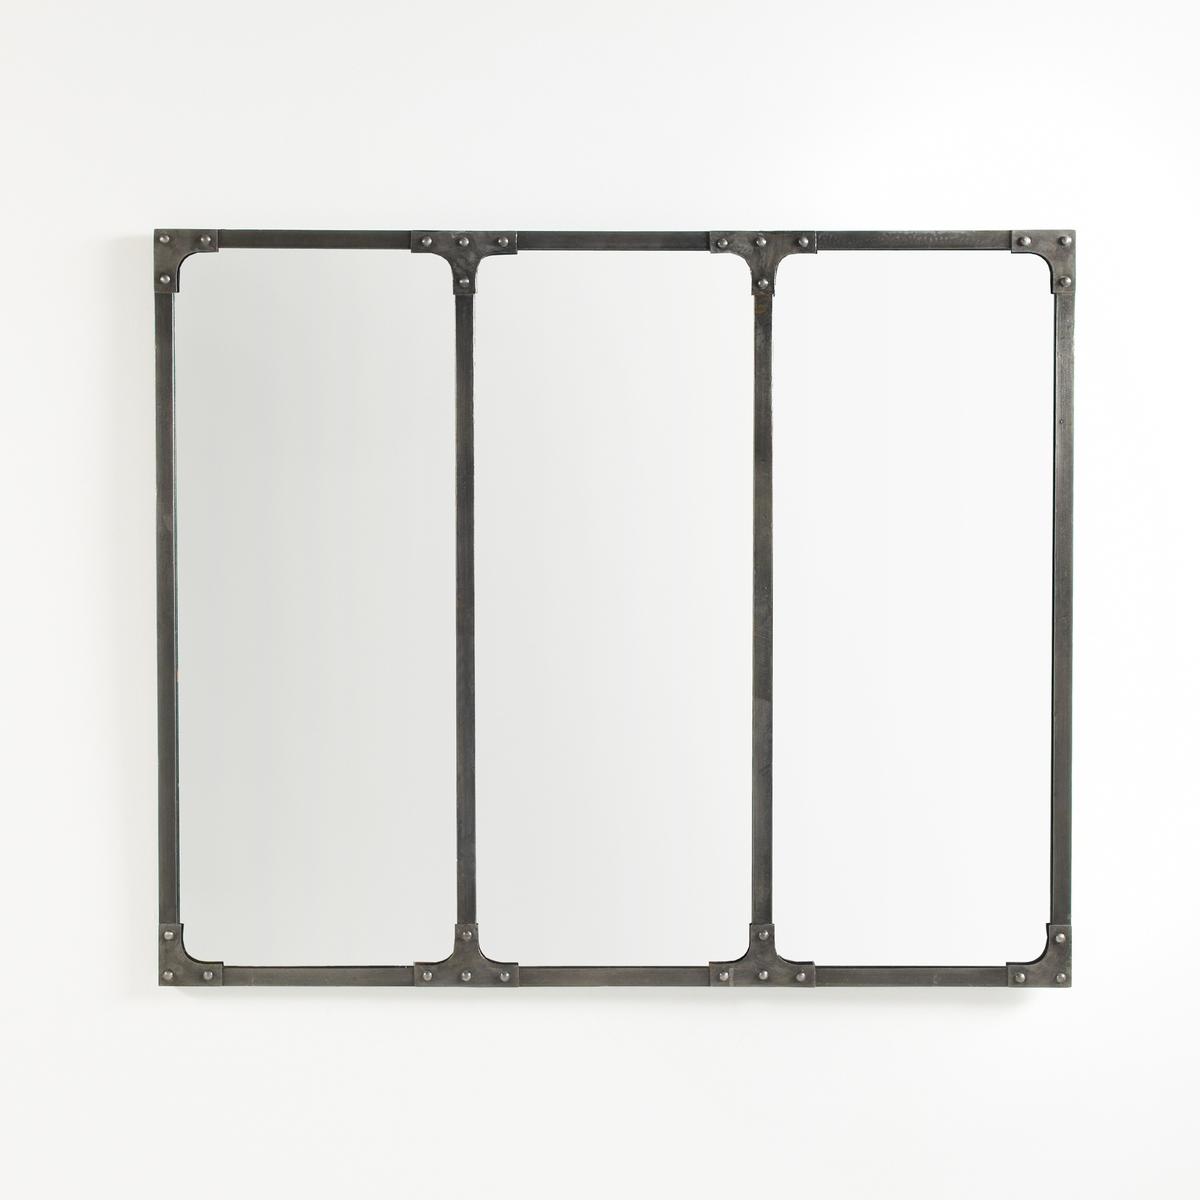 Зеркало в стиле хай-тек Lenaig ивангай хаю хай с вами ивангай eenote от ивана рудского фото